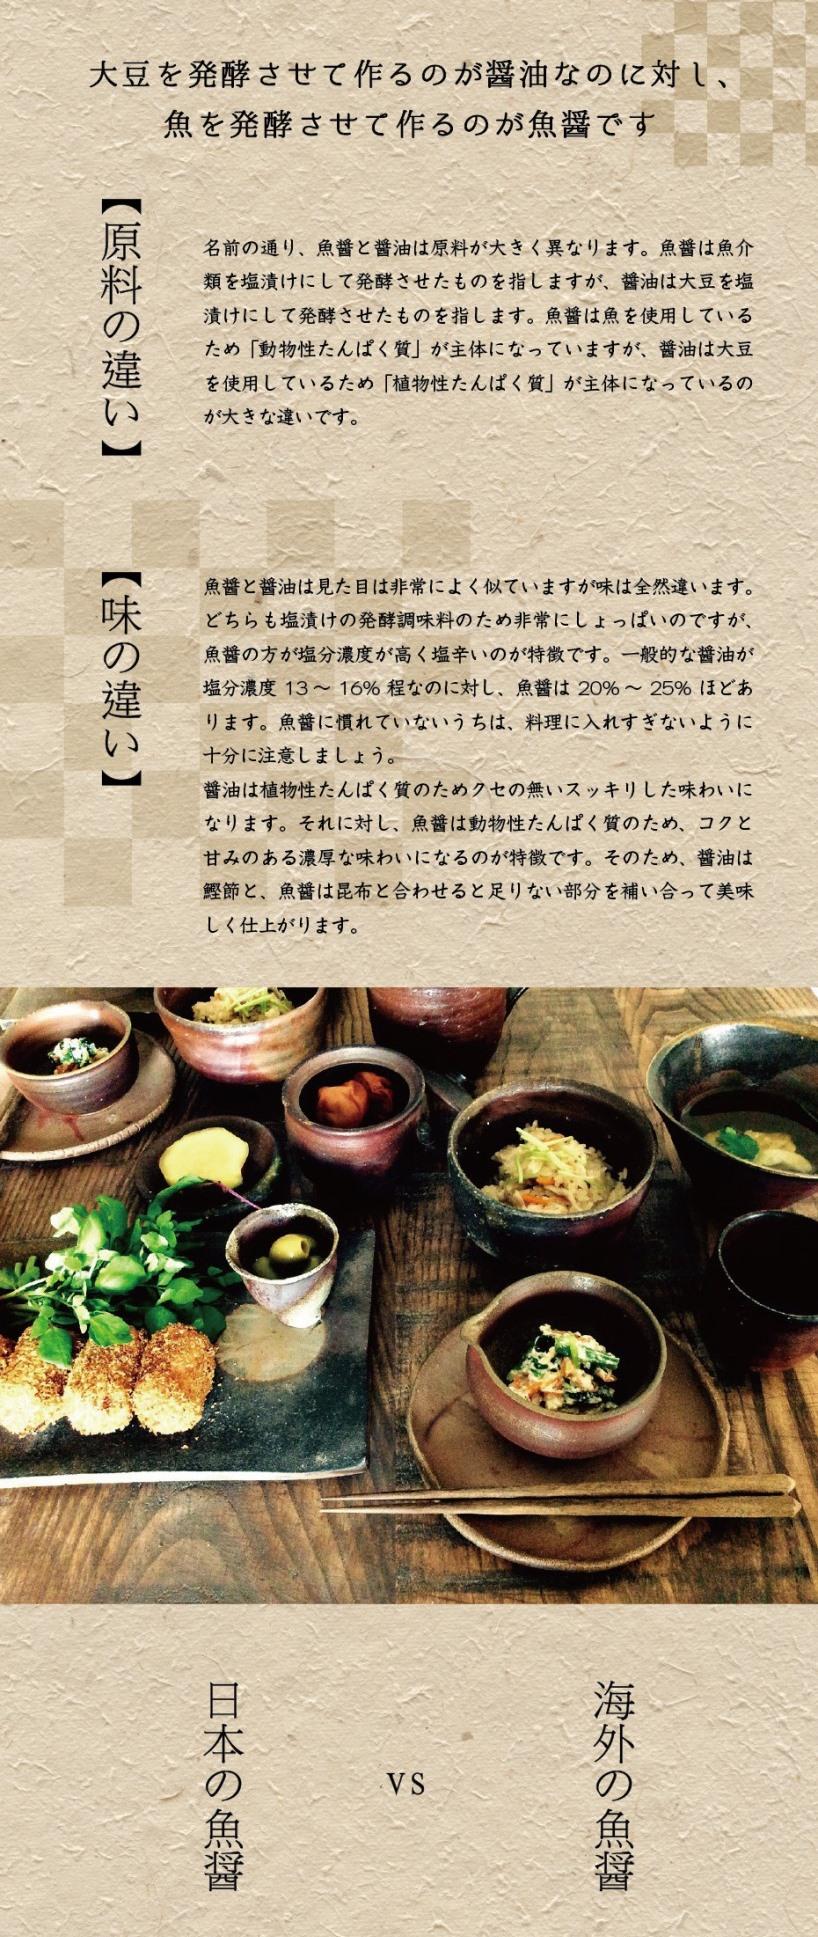 0319_gyosho-3.jpg